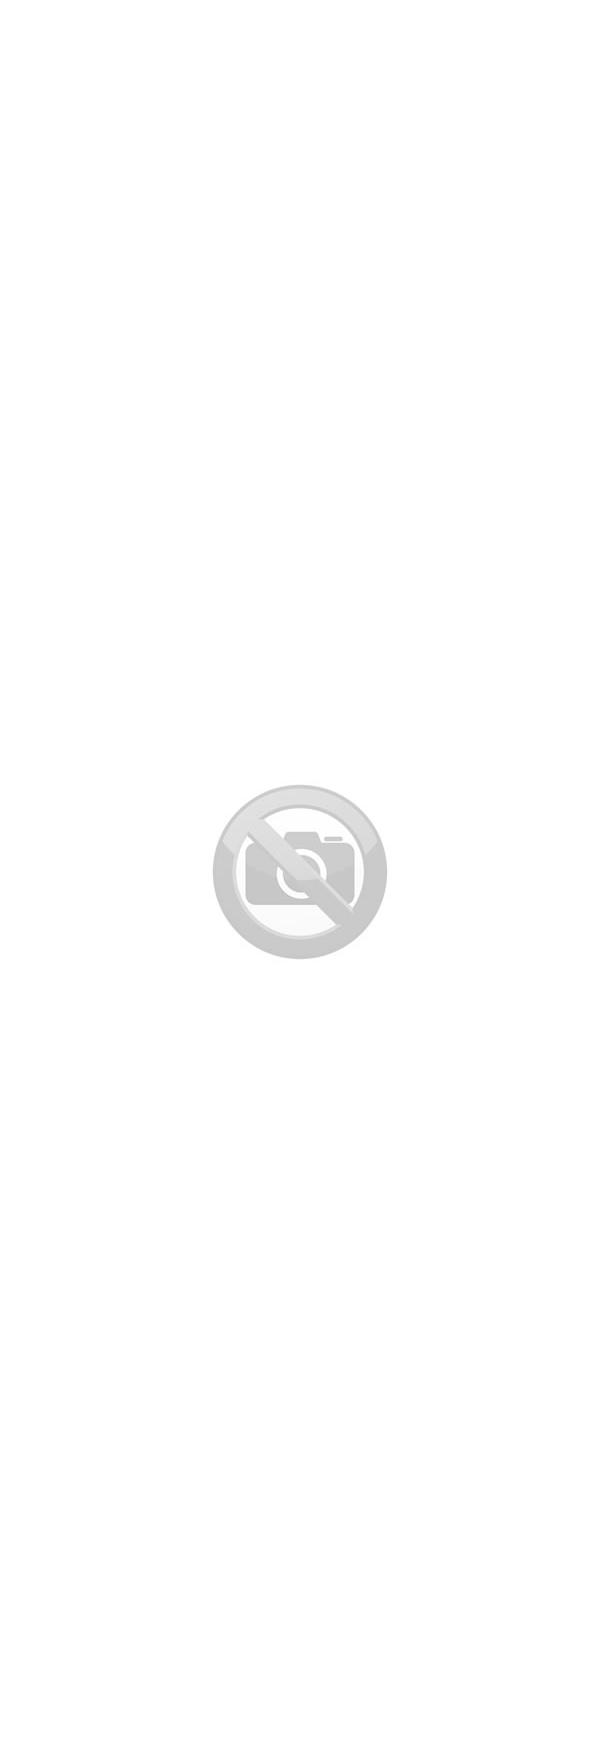 Online pujcka pred výplatou horní slavkov eva image 5